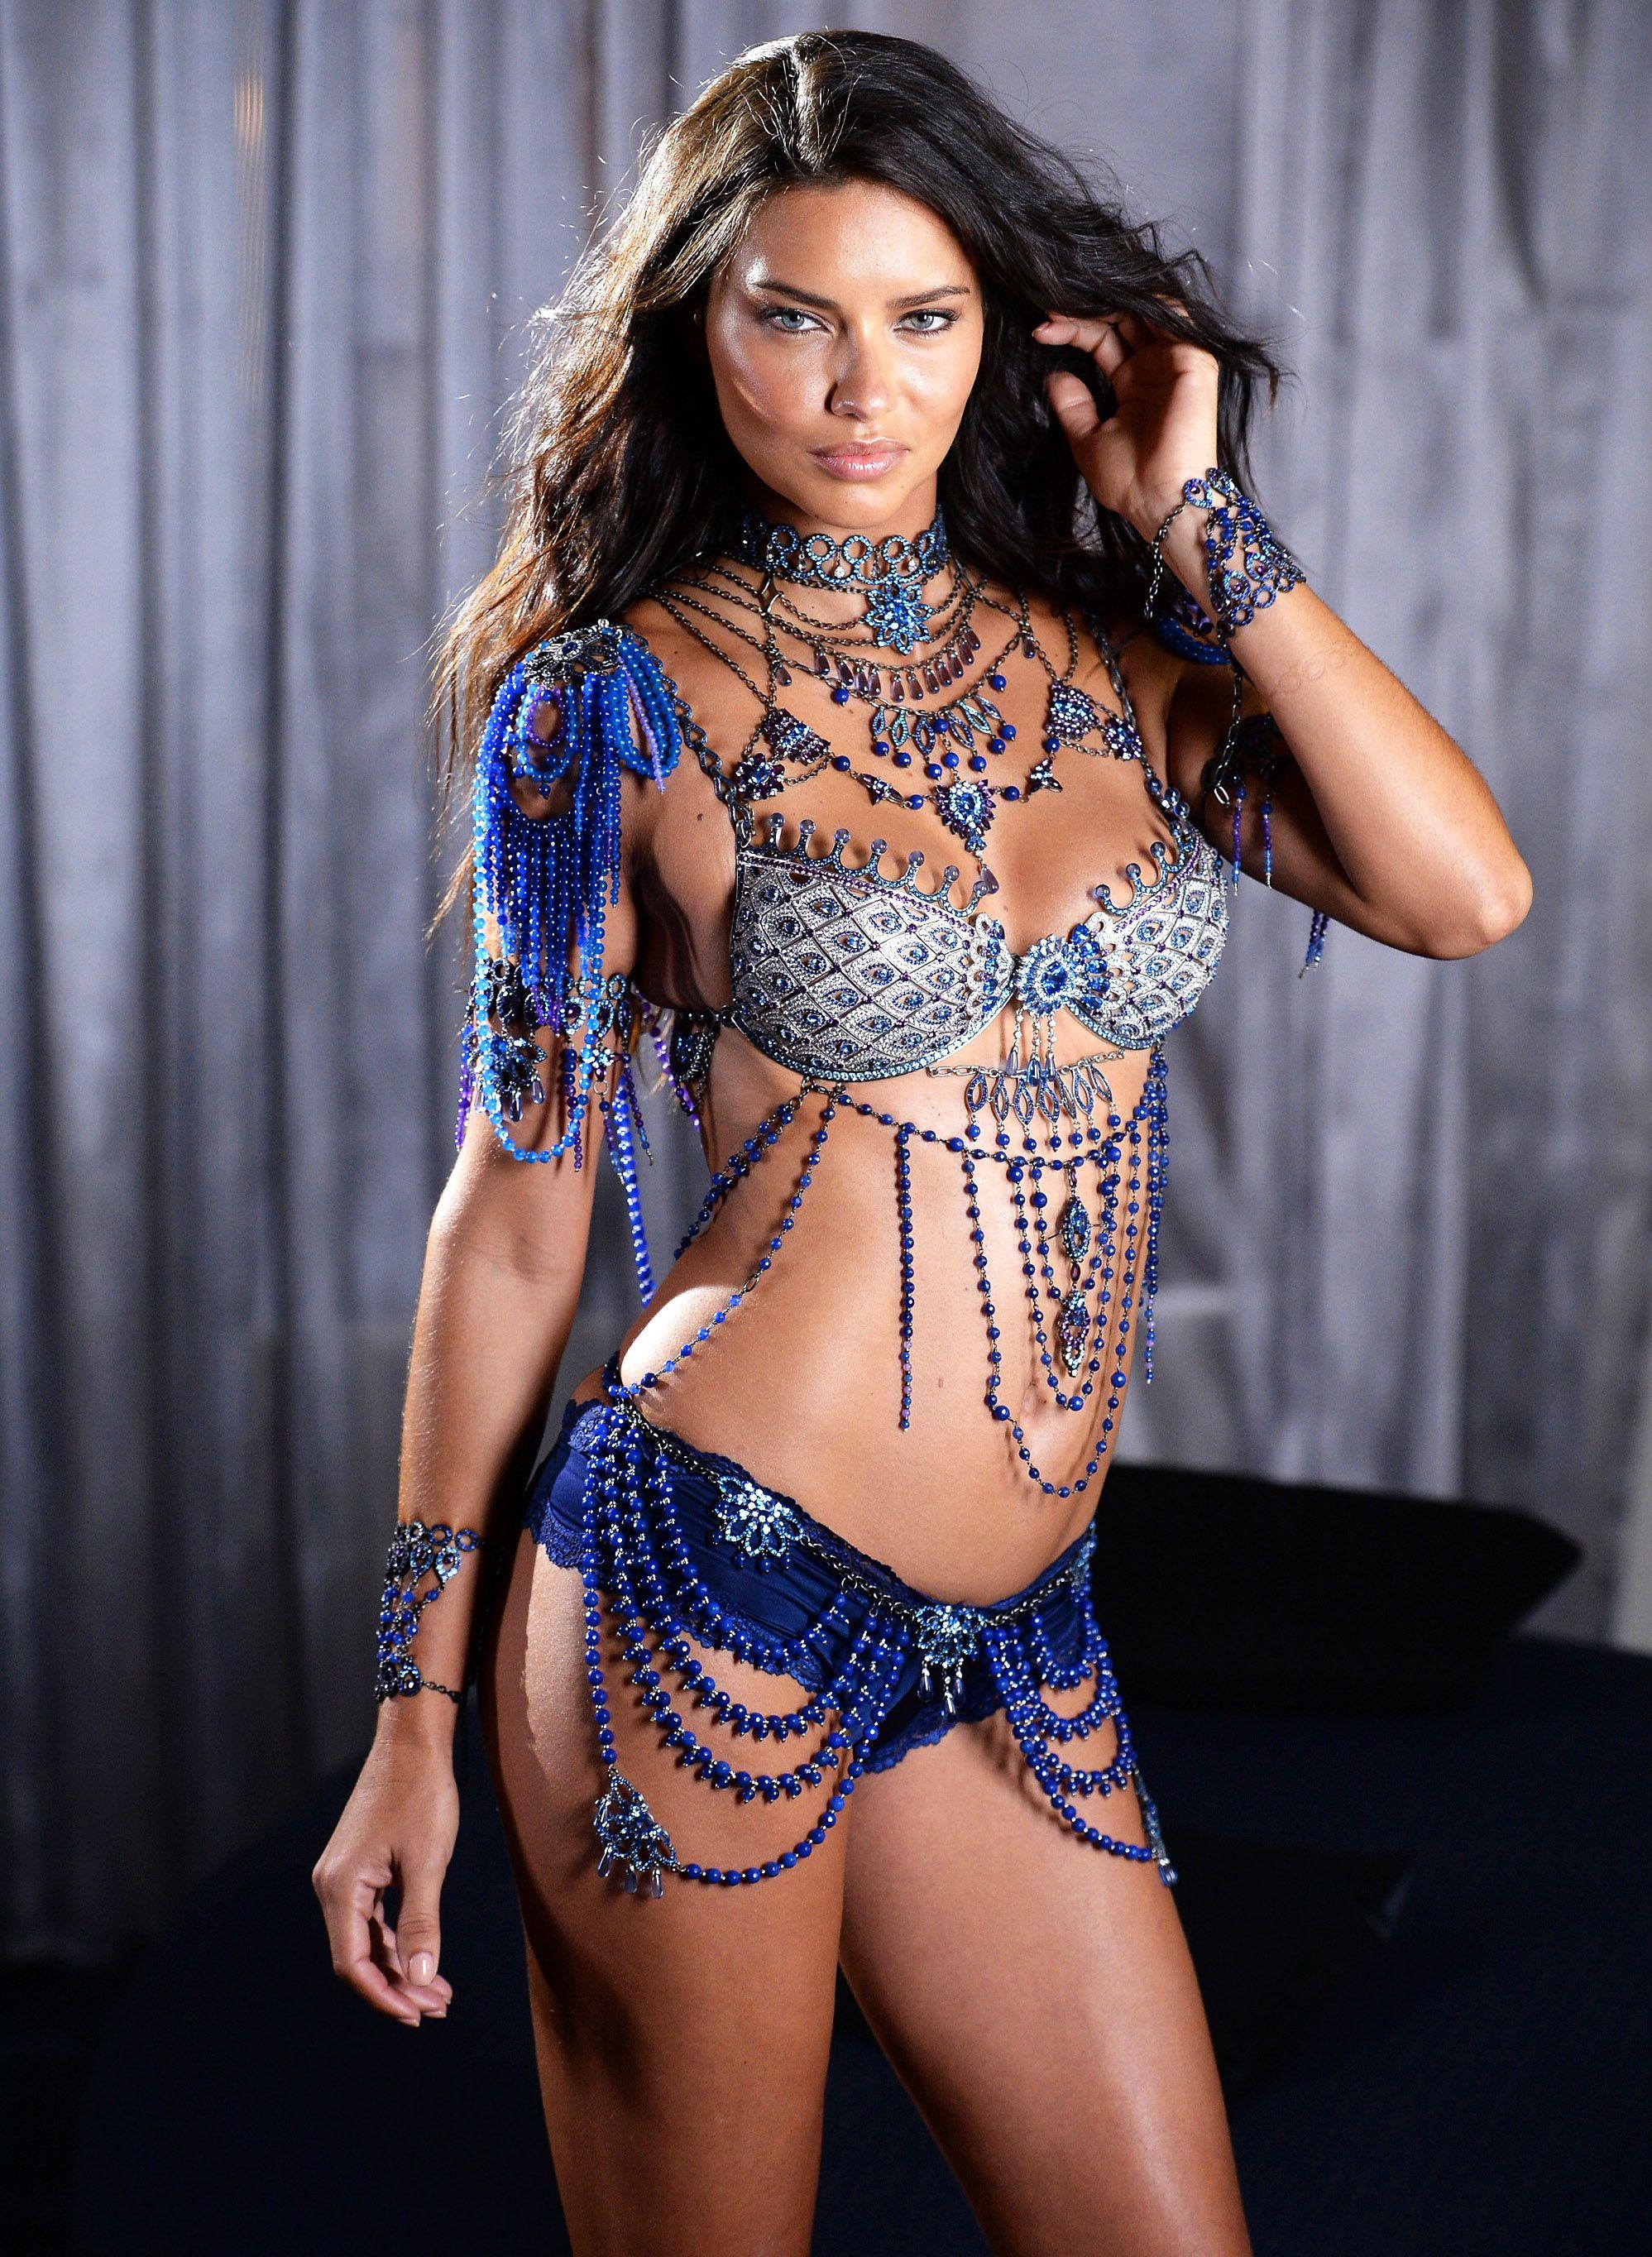 Резултат слика за adriana lima fantasy bra